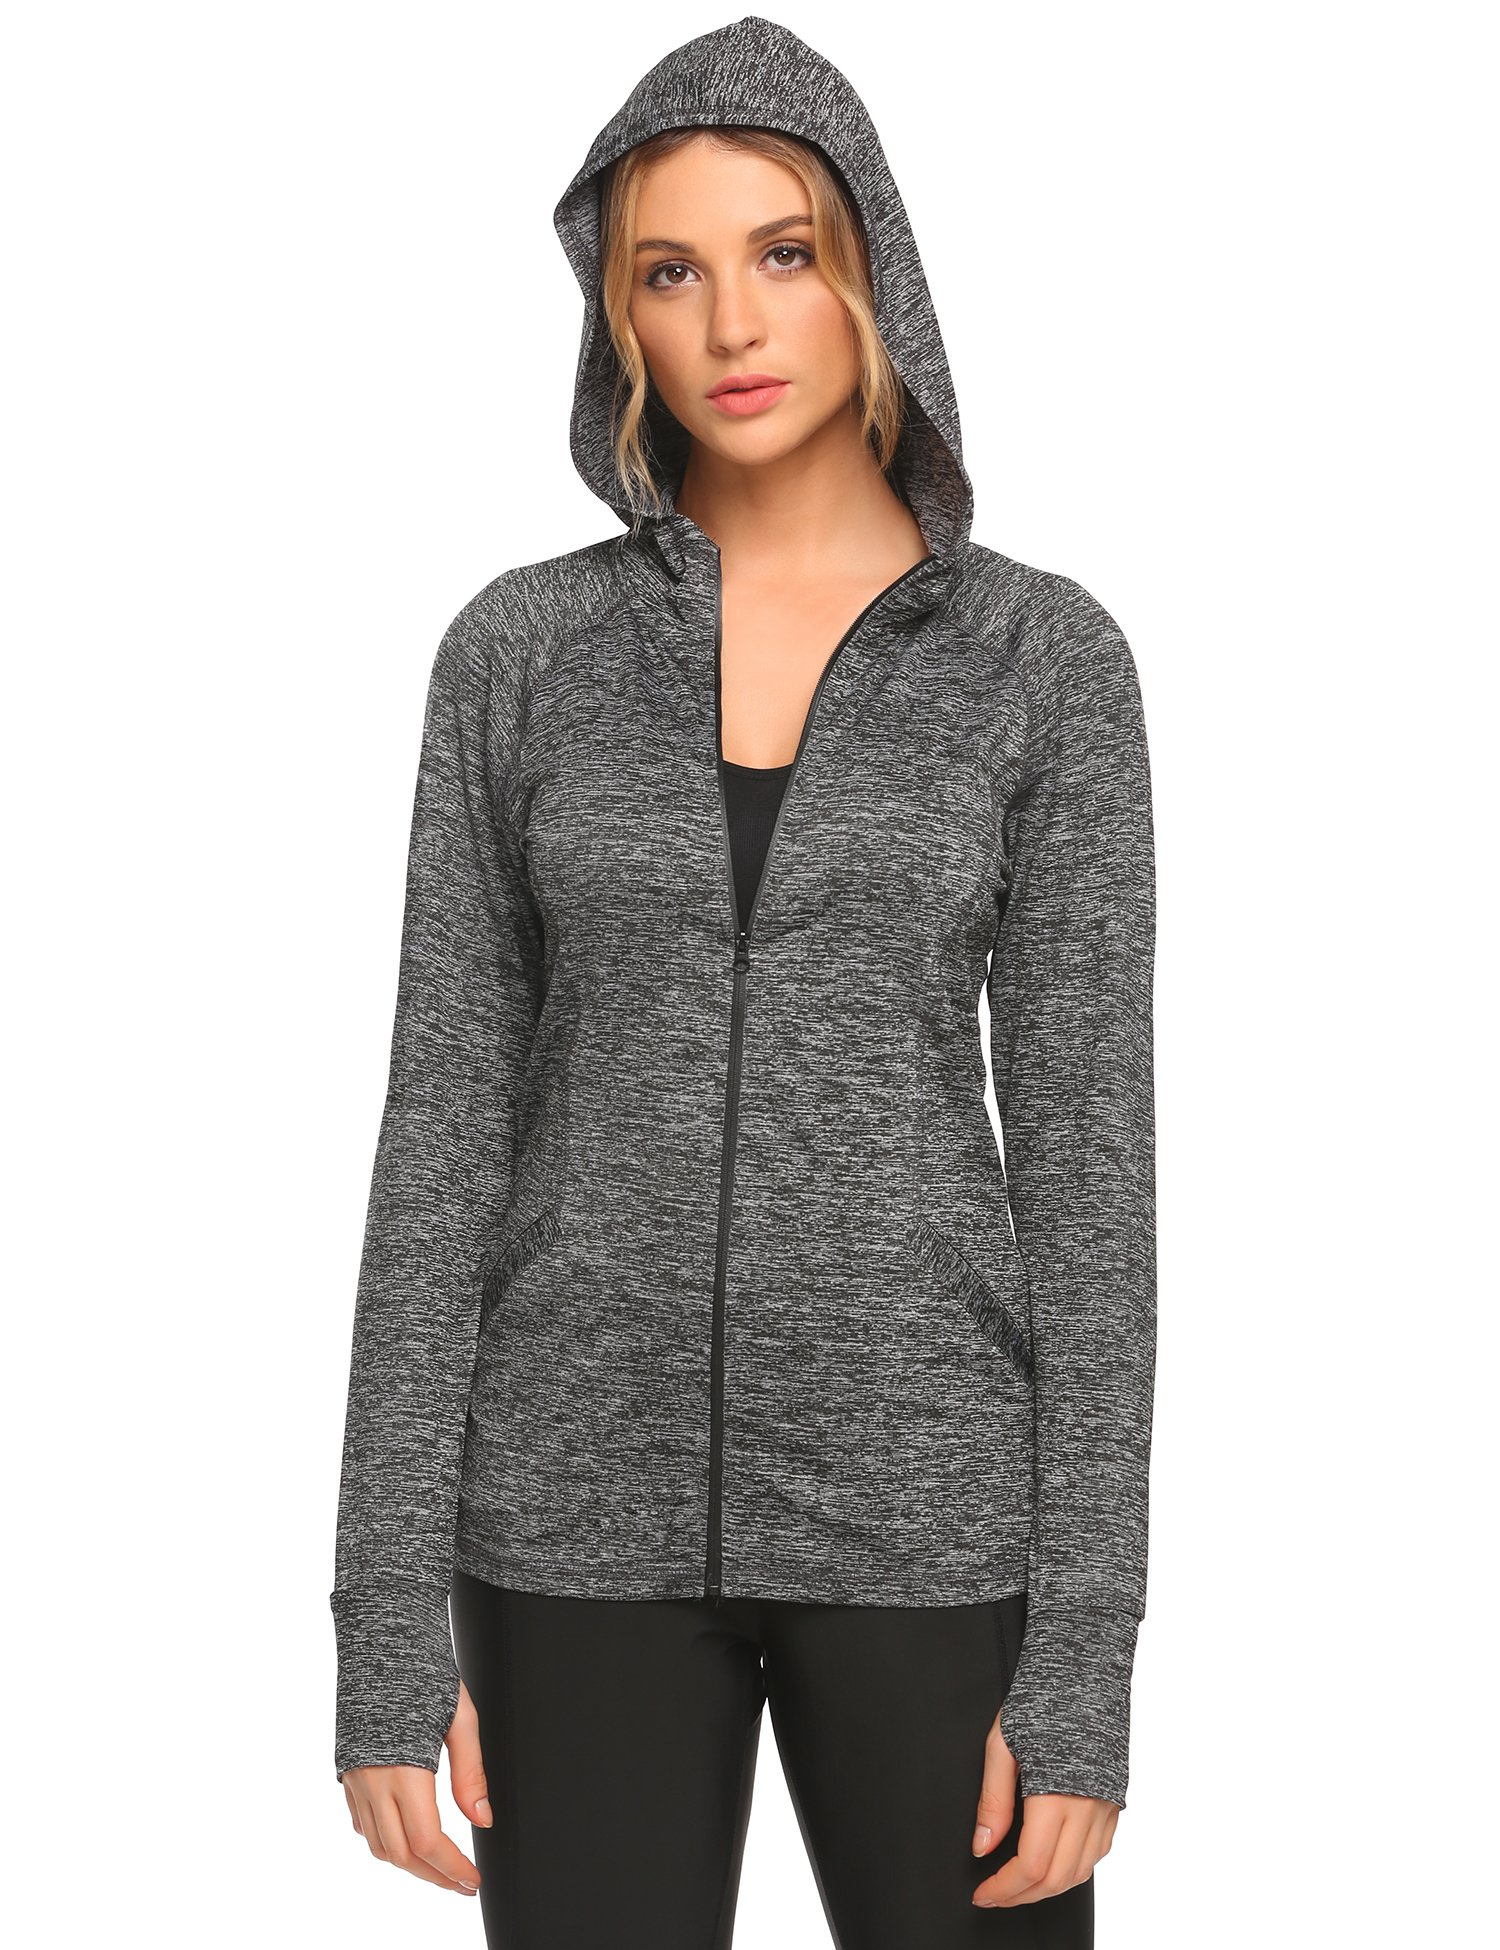 granate Women's Running Sports Jackets Full-Zip Hoodie Coat with Thumb Hole